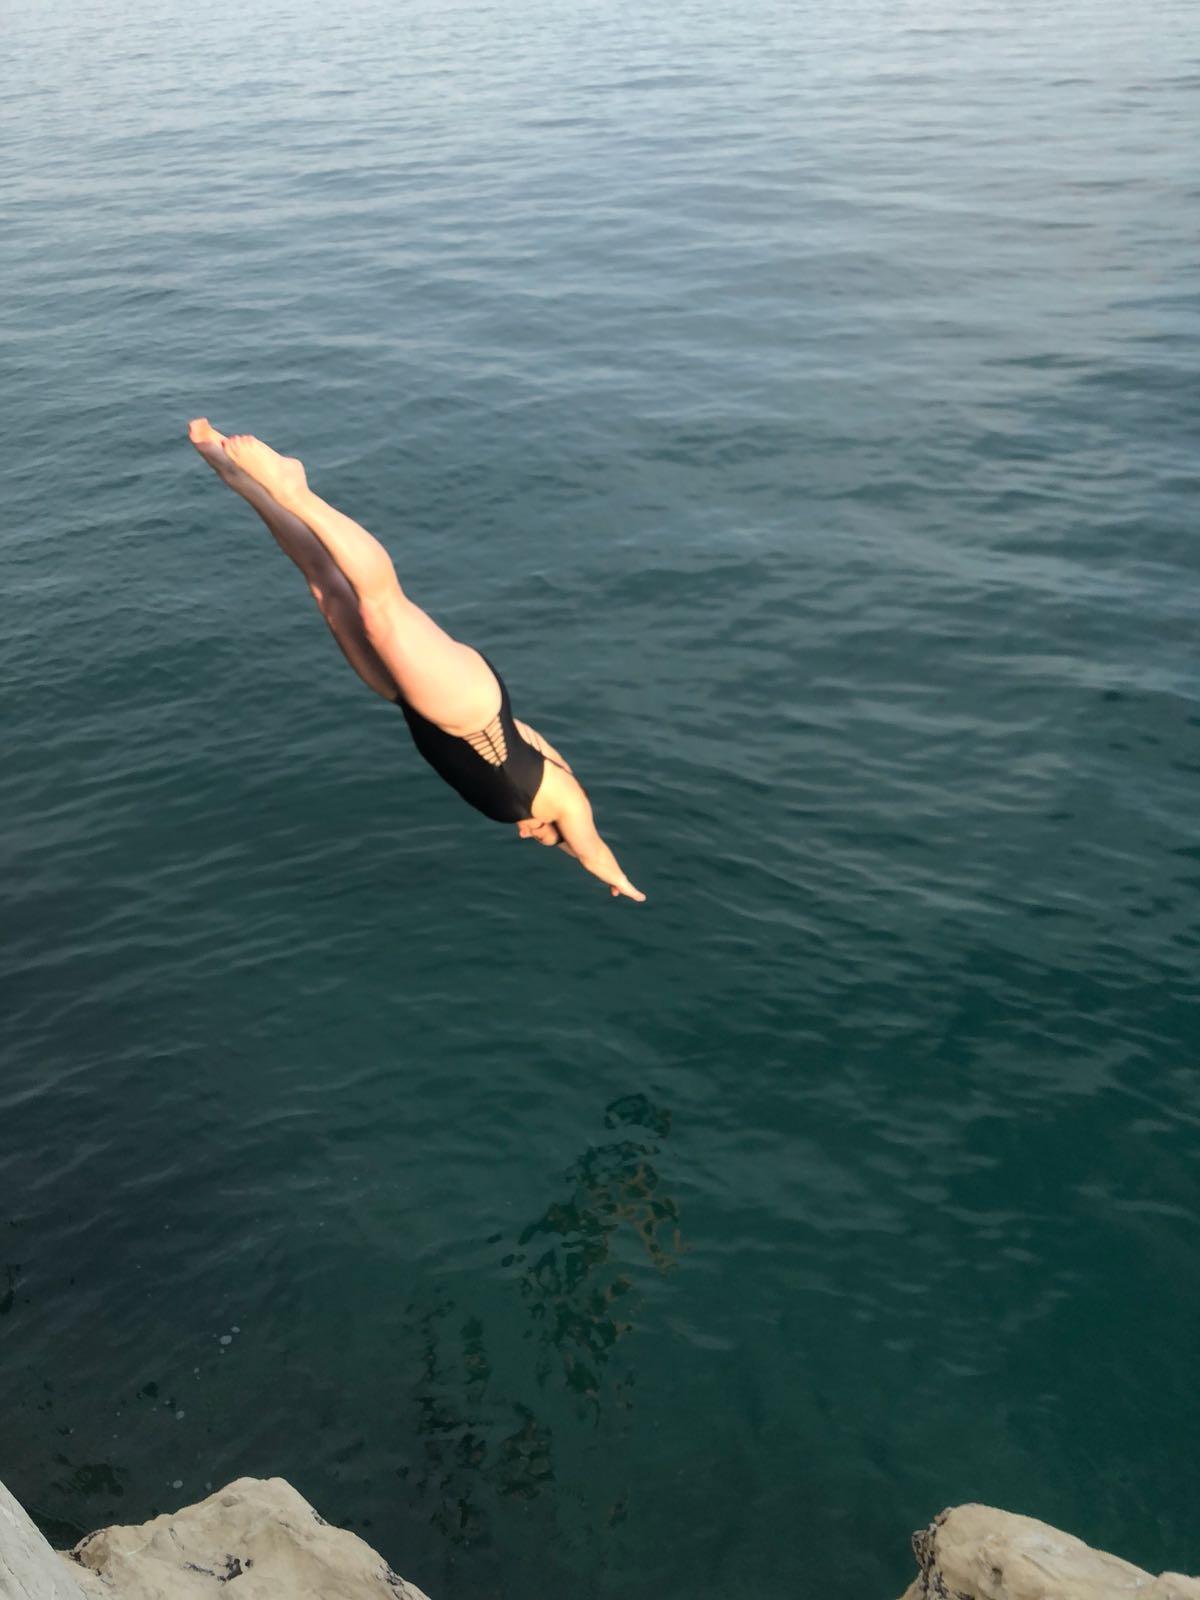 Cliff Diving into the Adriatic, Joe's Beach - Split, Croatia